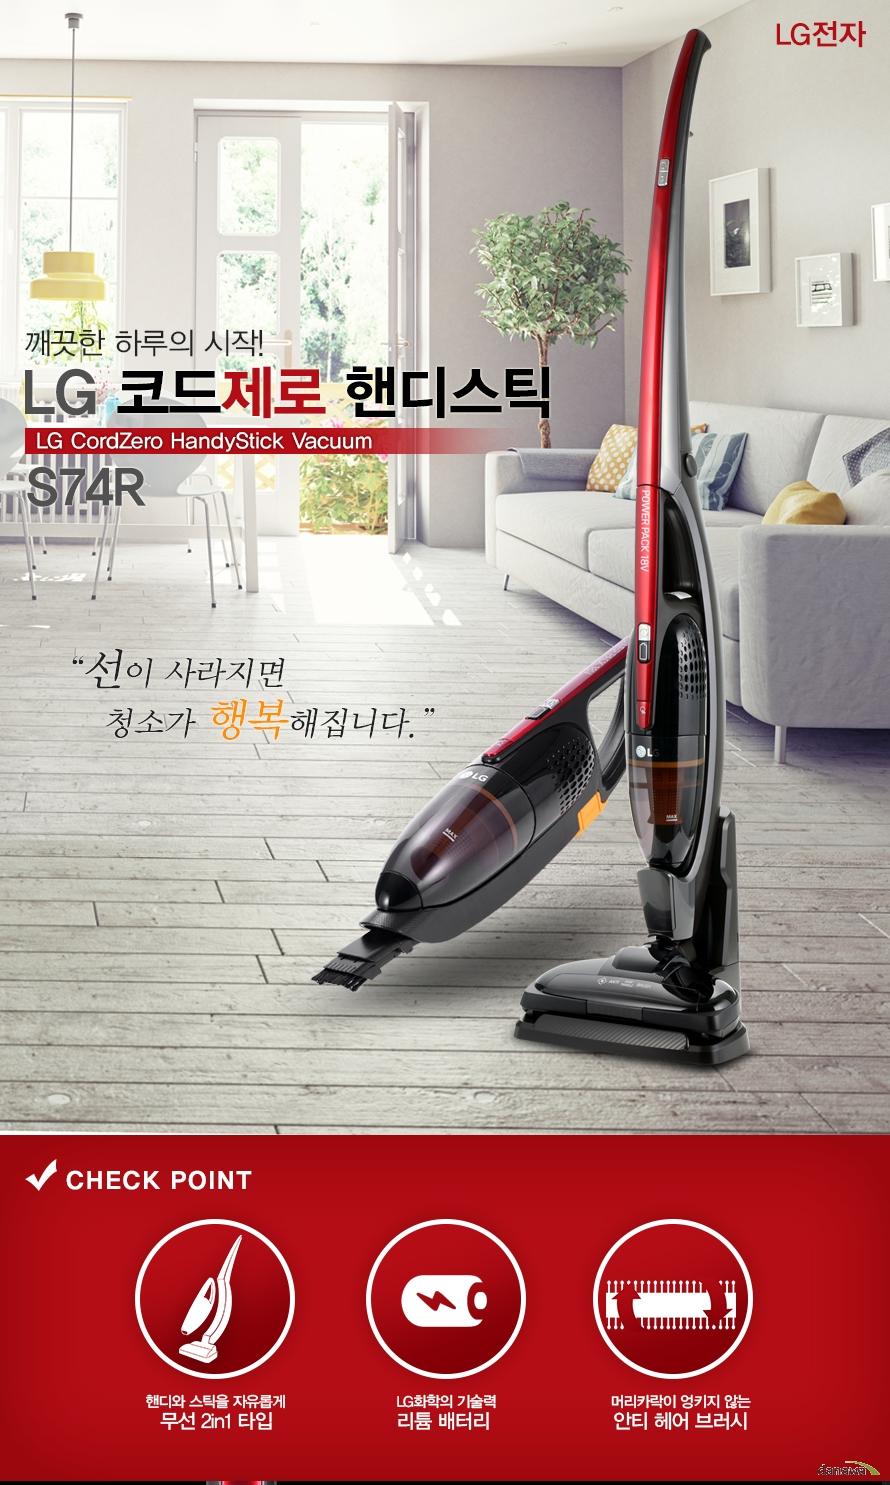 LG전자   깨끗한 하루의 시작   LG 코드제로 핸디스틱 LG CordZero HandyStick Vaccum   S74R   선이 사라지면 청소가 행복해집니다.      Check point   핸디와 스틱을 자유롭게 무선2In1타입   LG화학의 기술력 리튬 배터리   머리카락이 엉키지 않는 안티 헤어브러시